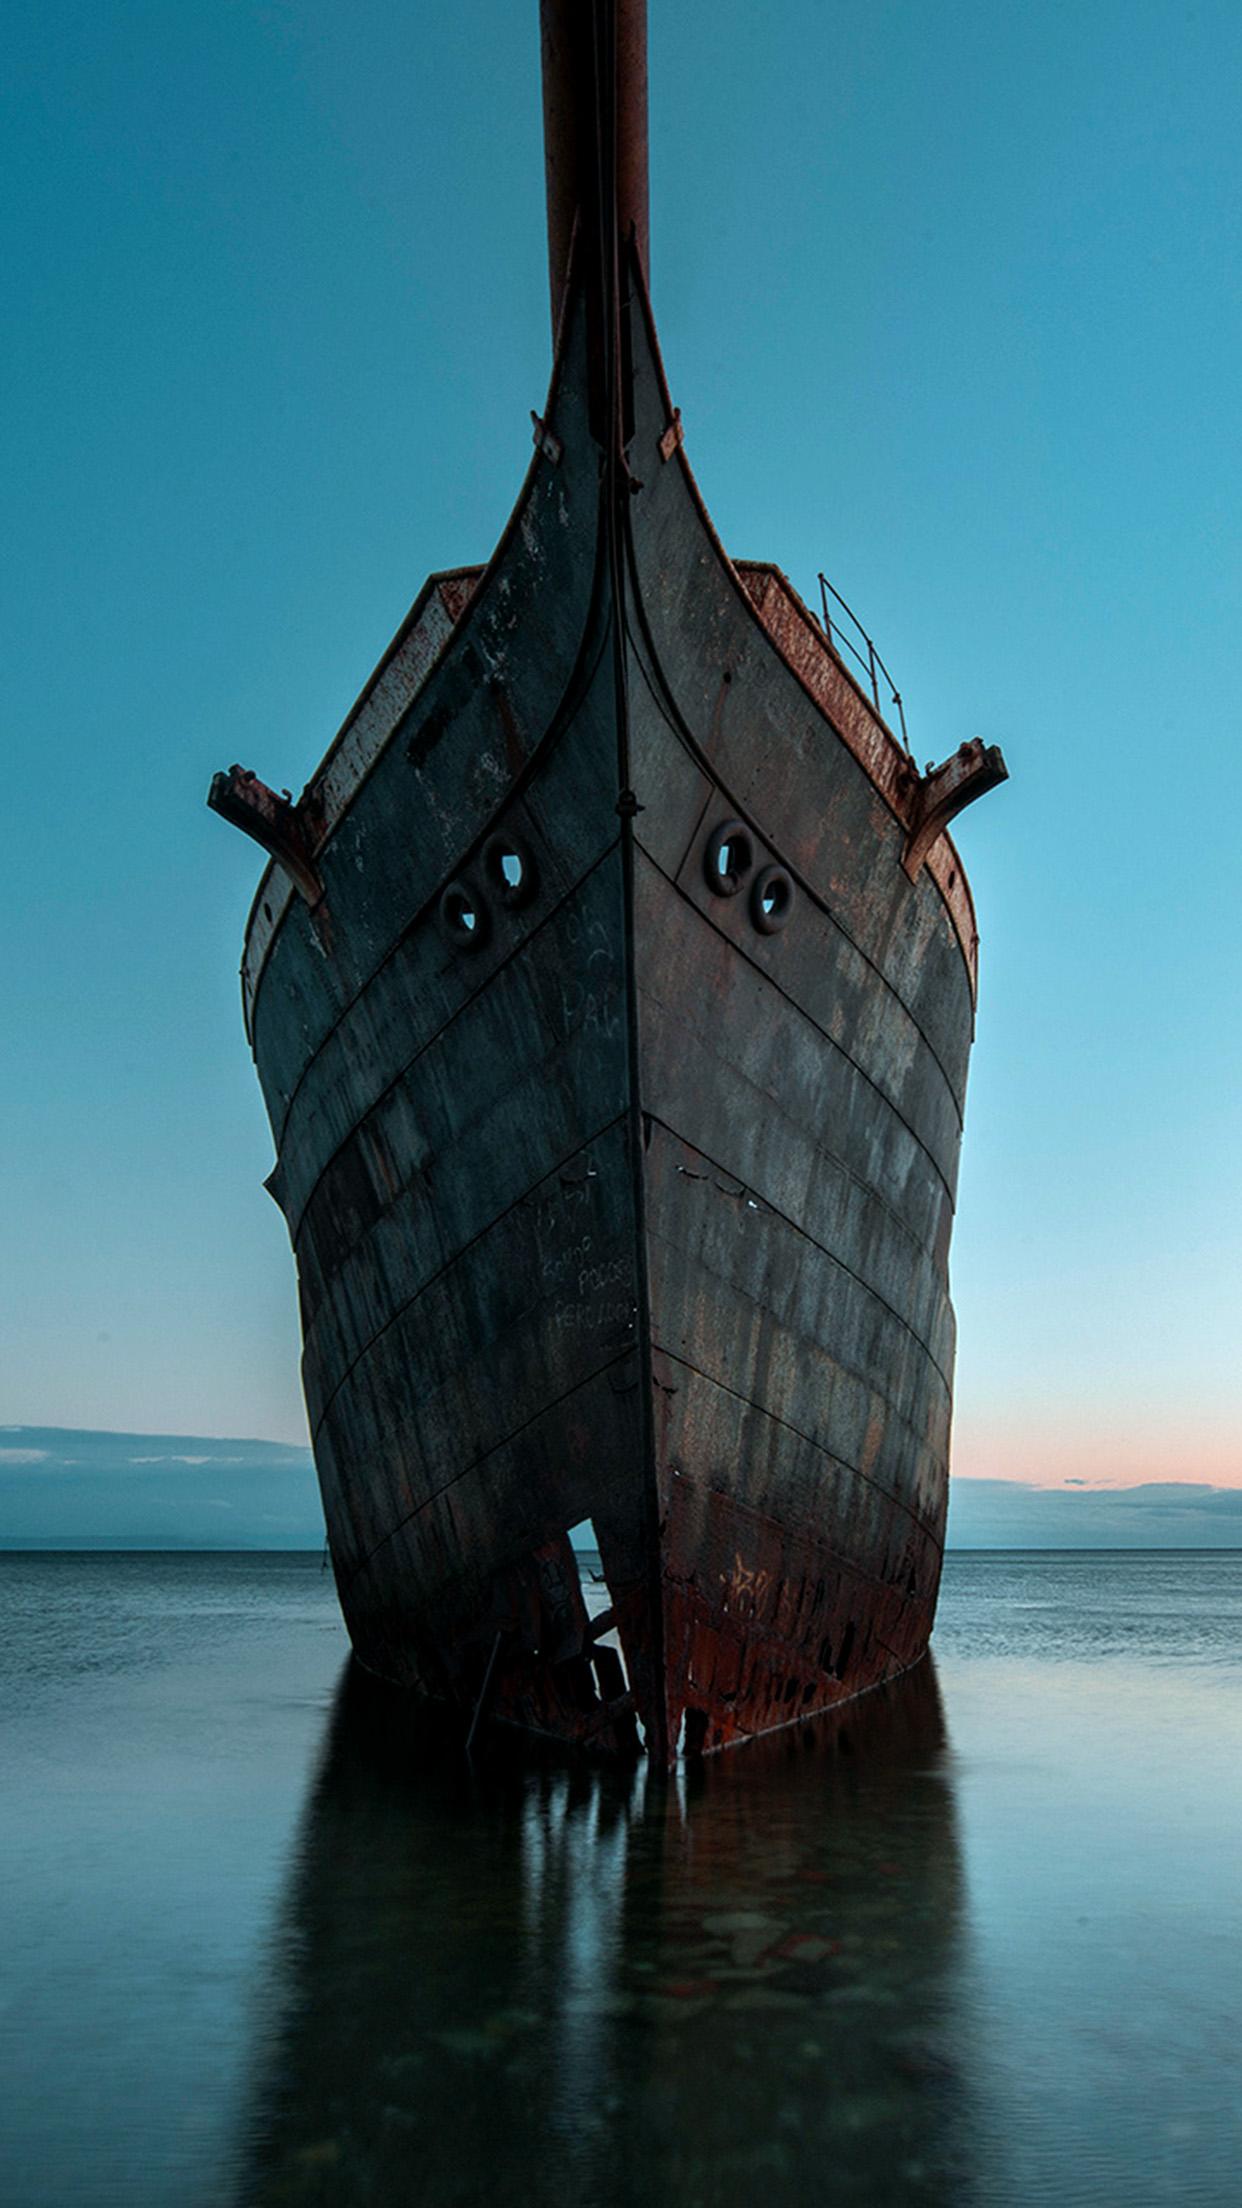 Iphone6paperscom Iphone 6 Wallpaper Bh28 Boat Ship Sea